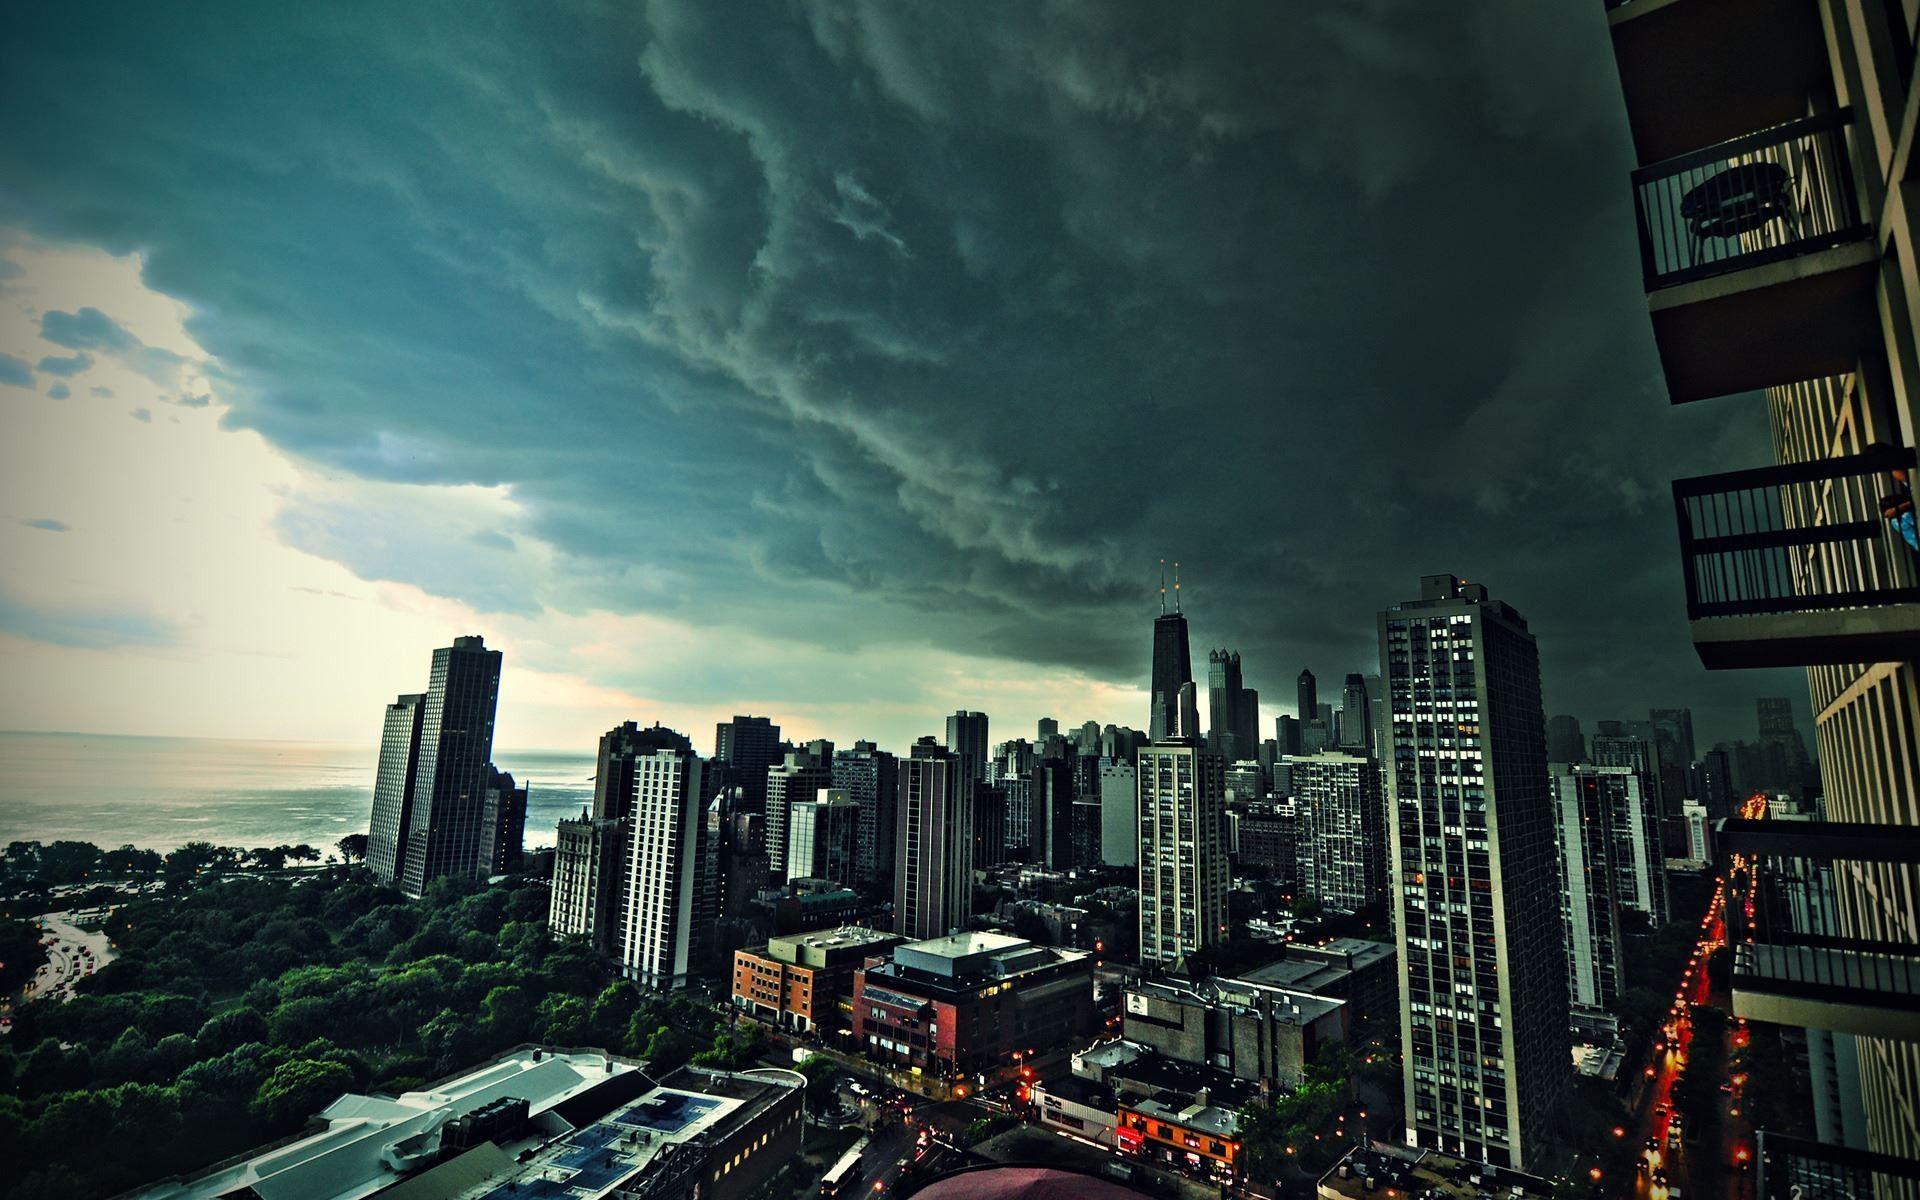 Storm Clouds Over City 1920x1200 - ImgPrix